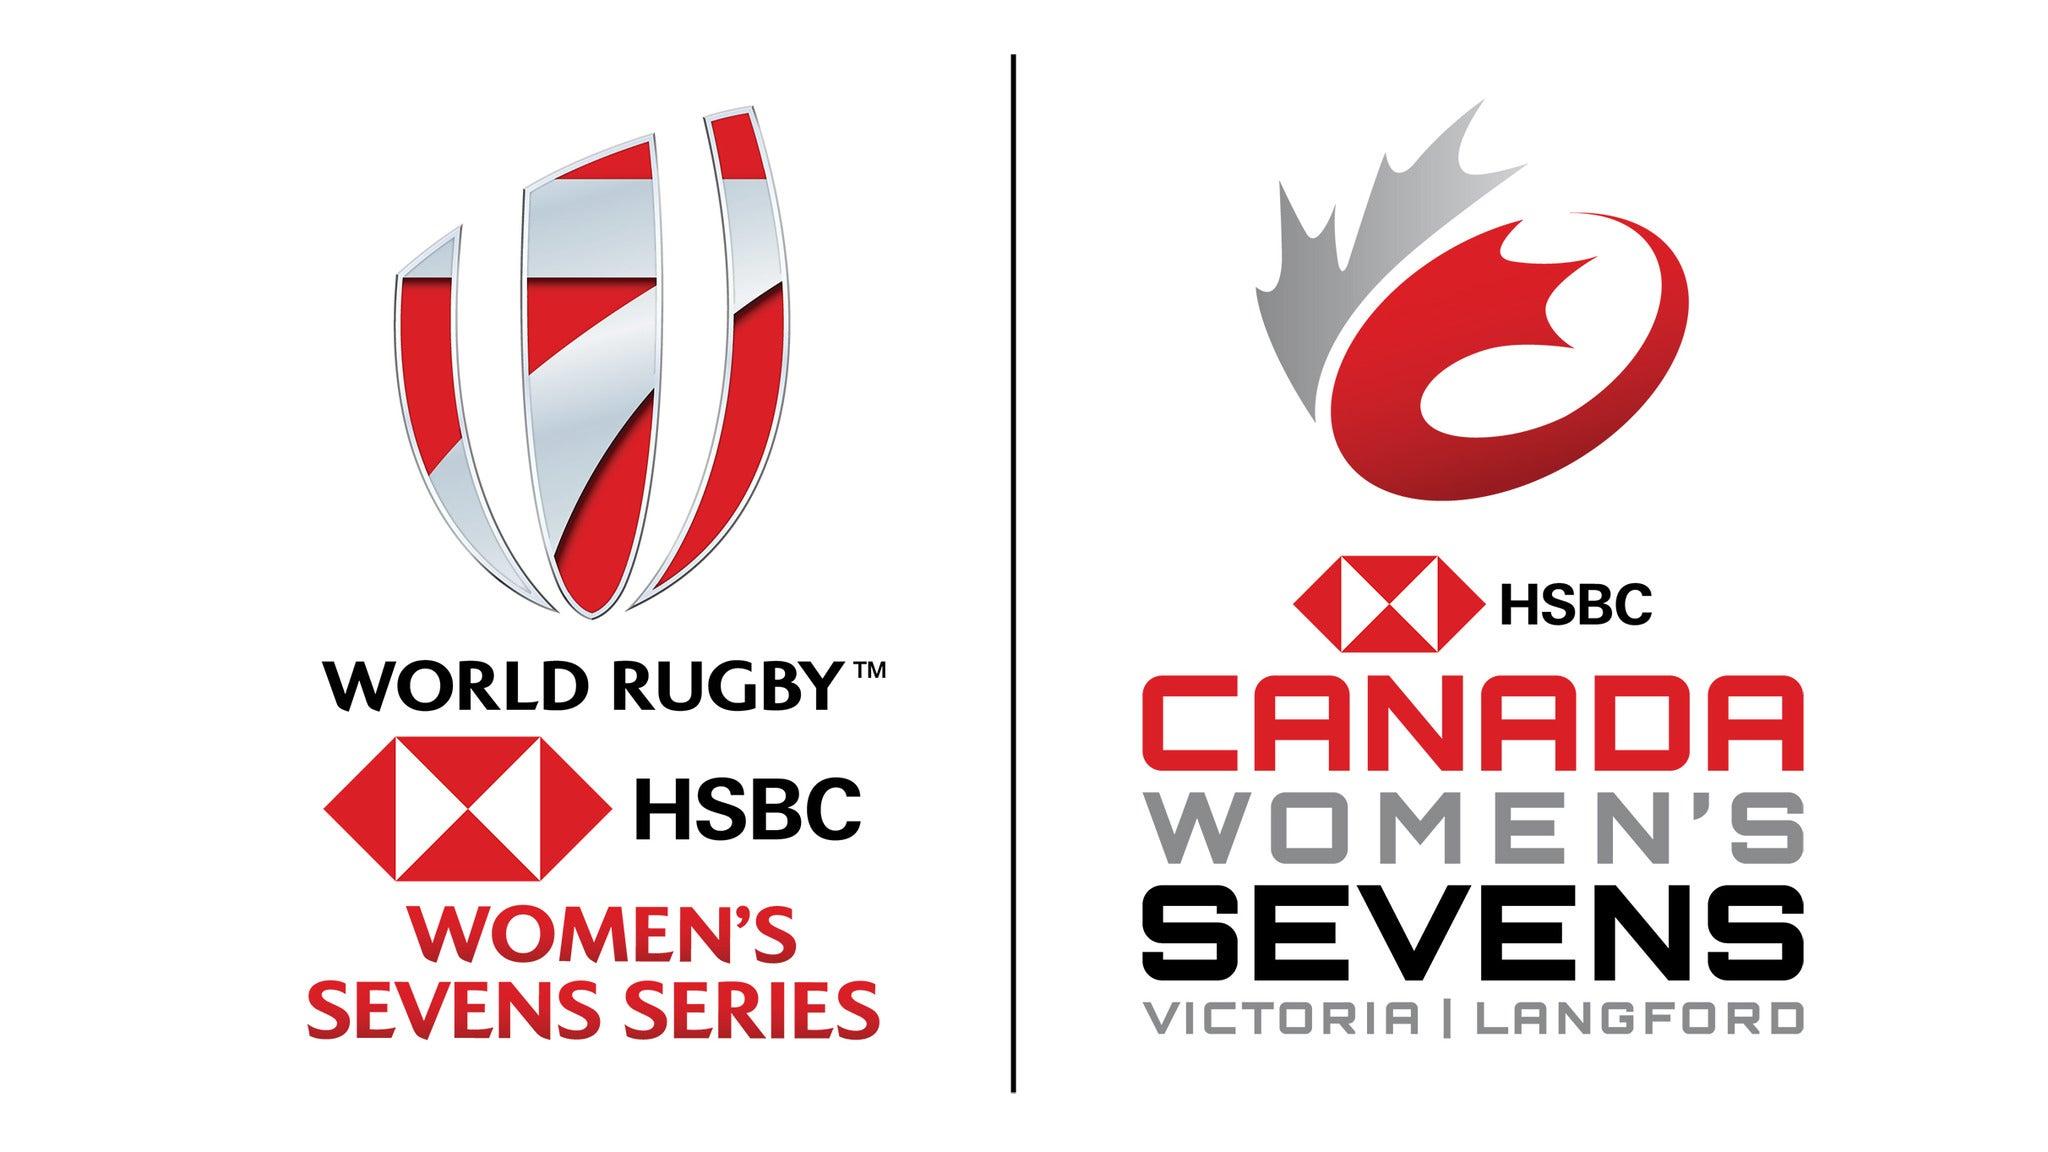 HSBC Canada Women's Sevens